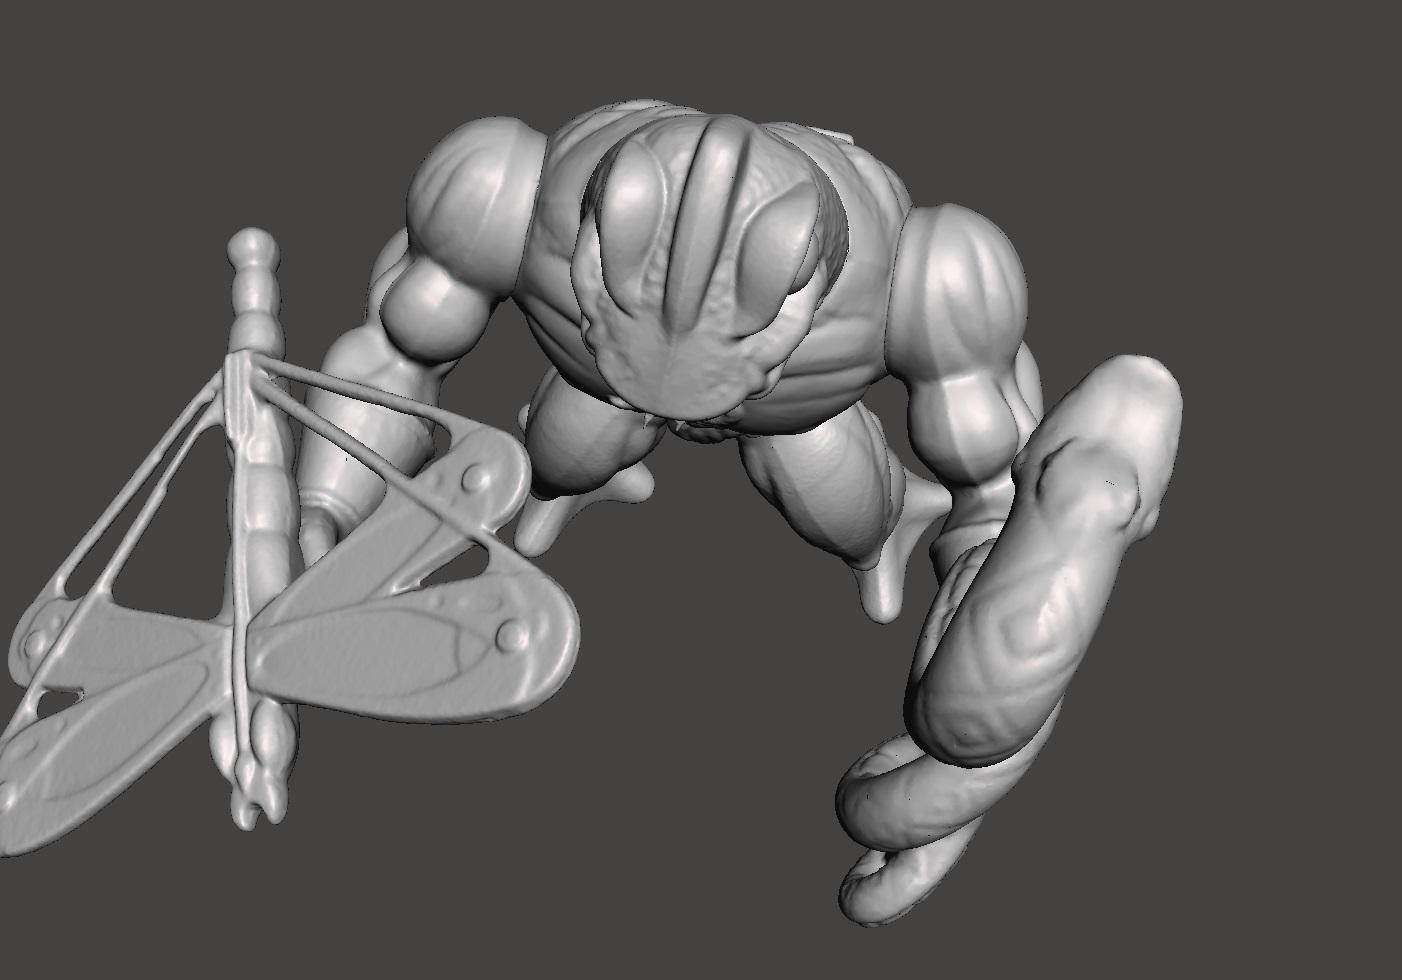 05_TUNG_LASHOR.jpg Download STL file TUNG LASHOR MOTU VINTAGE ACTION FIGURE (COMPLETE) • 3D printer object, VintageToysMG